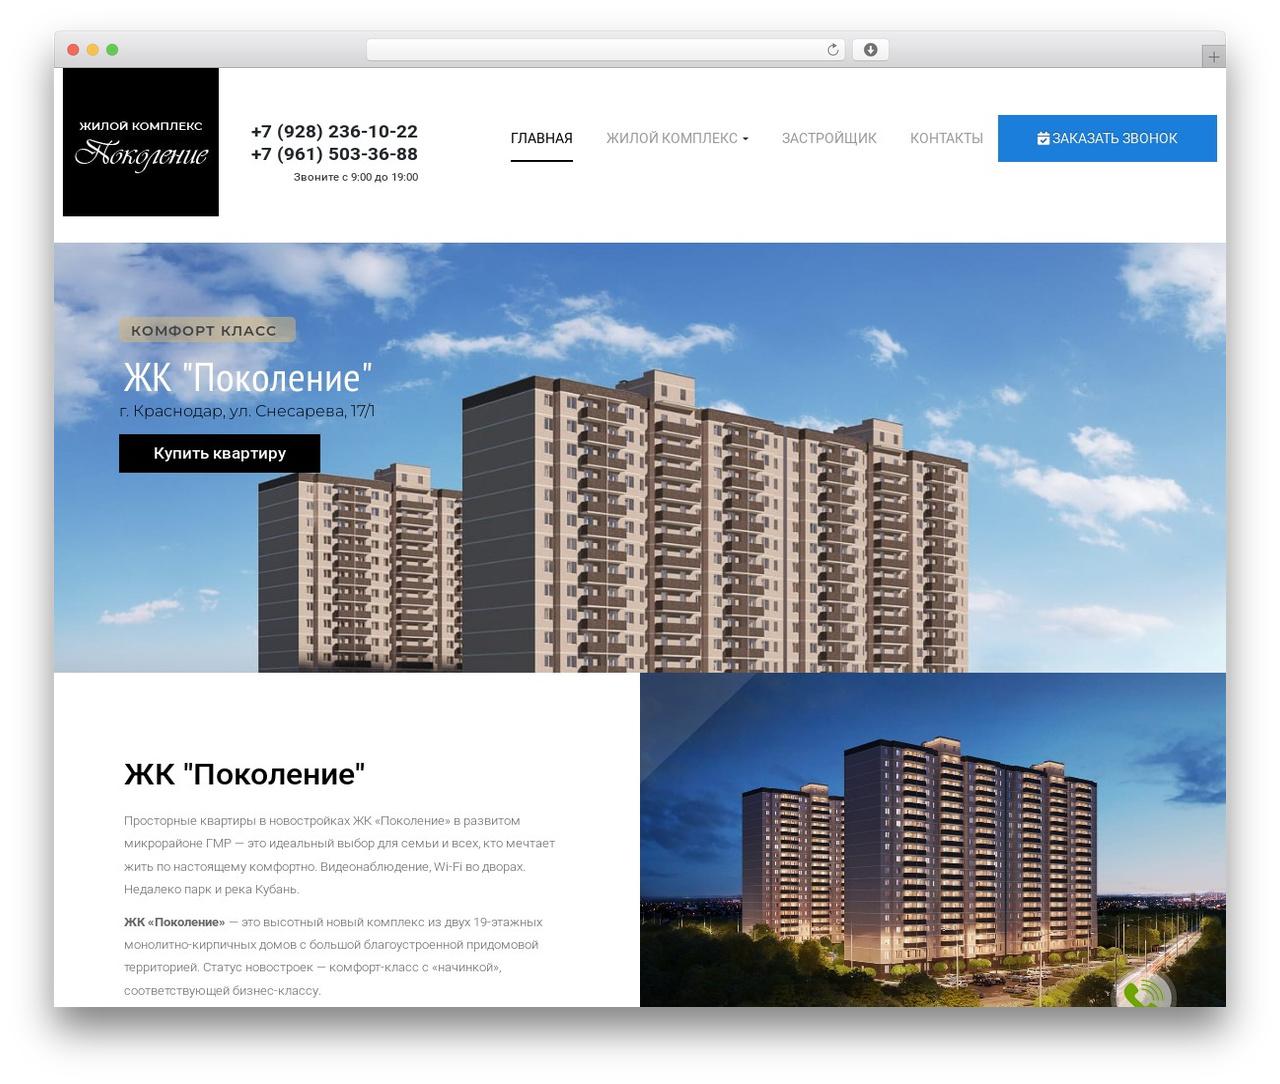 opalhomes WordPress website template - xn--e1aabjiahrfbi.xn--p1ai